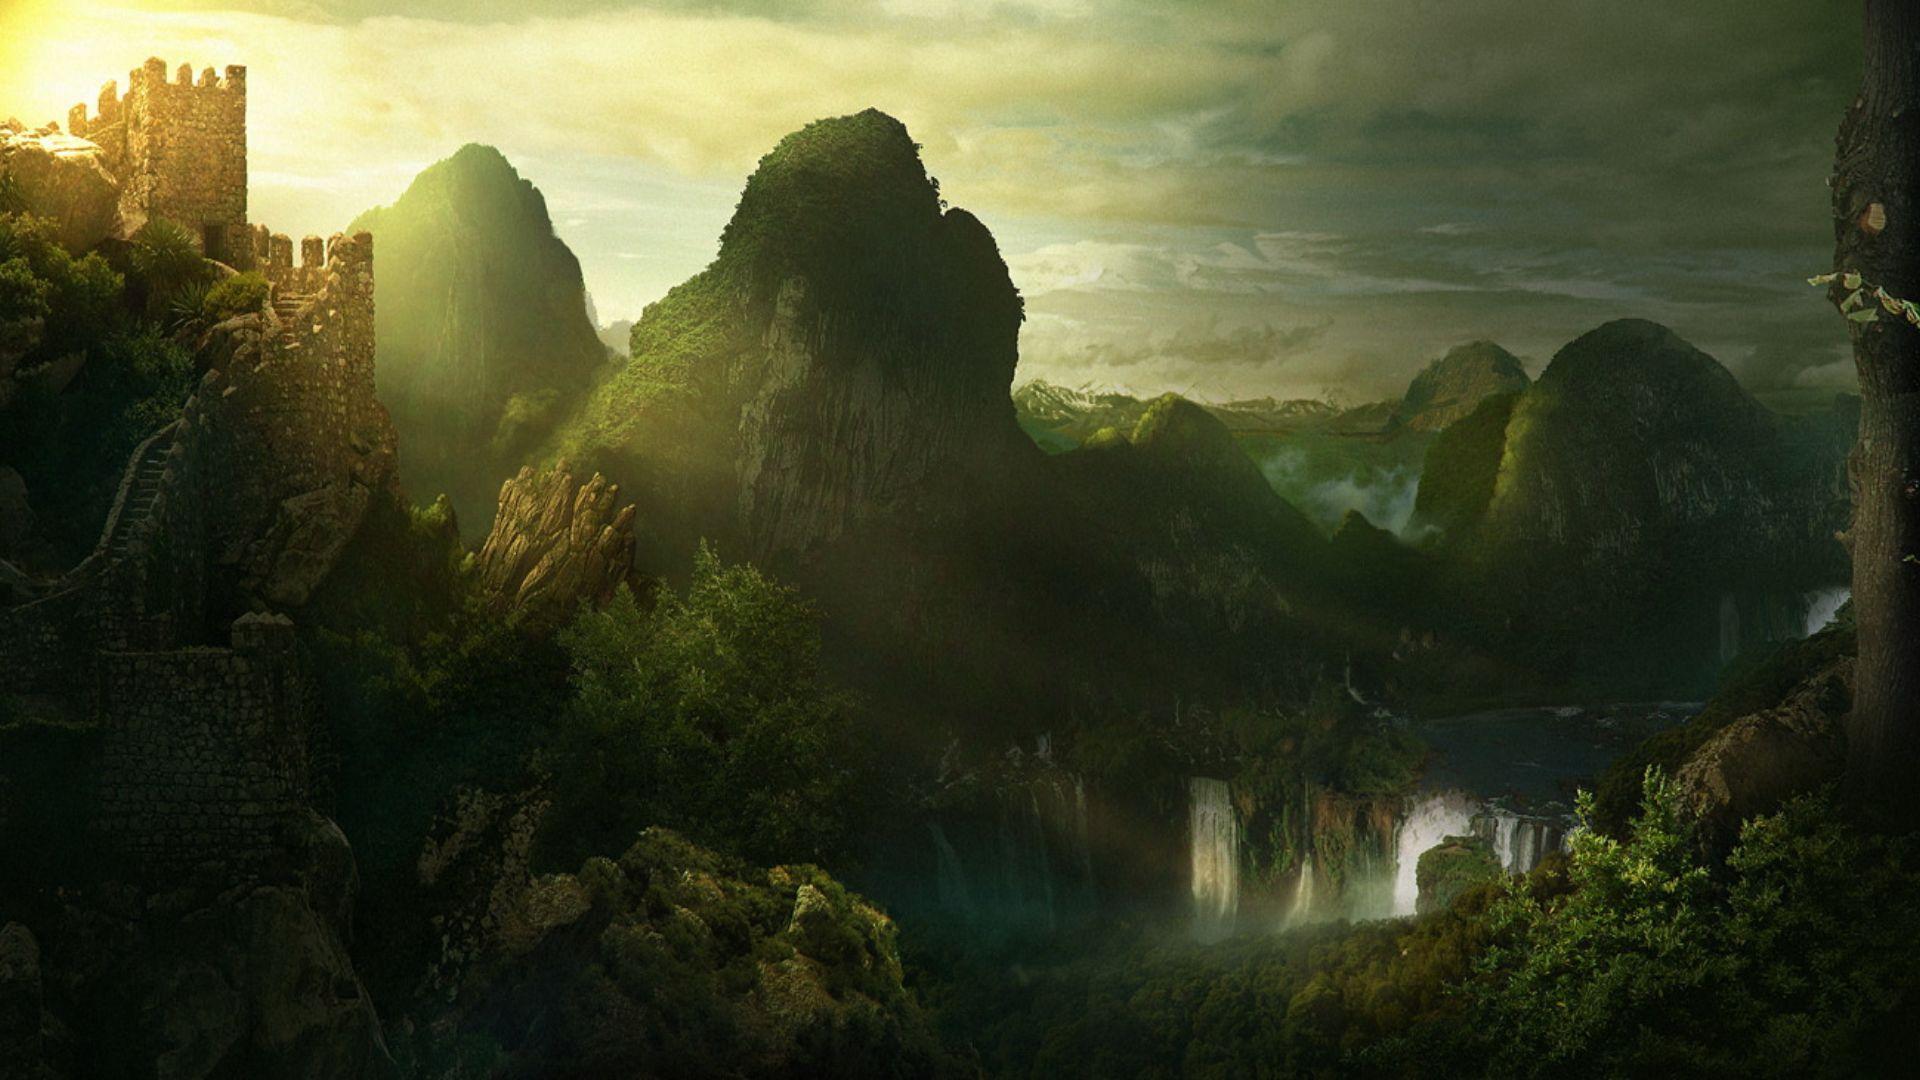 Epicmusicvn Wallpaper Fantasy Landscape Landscape Wallpaper